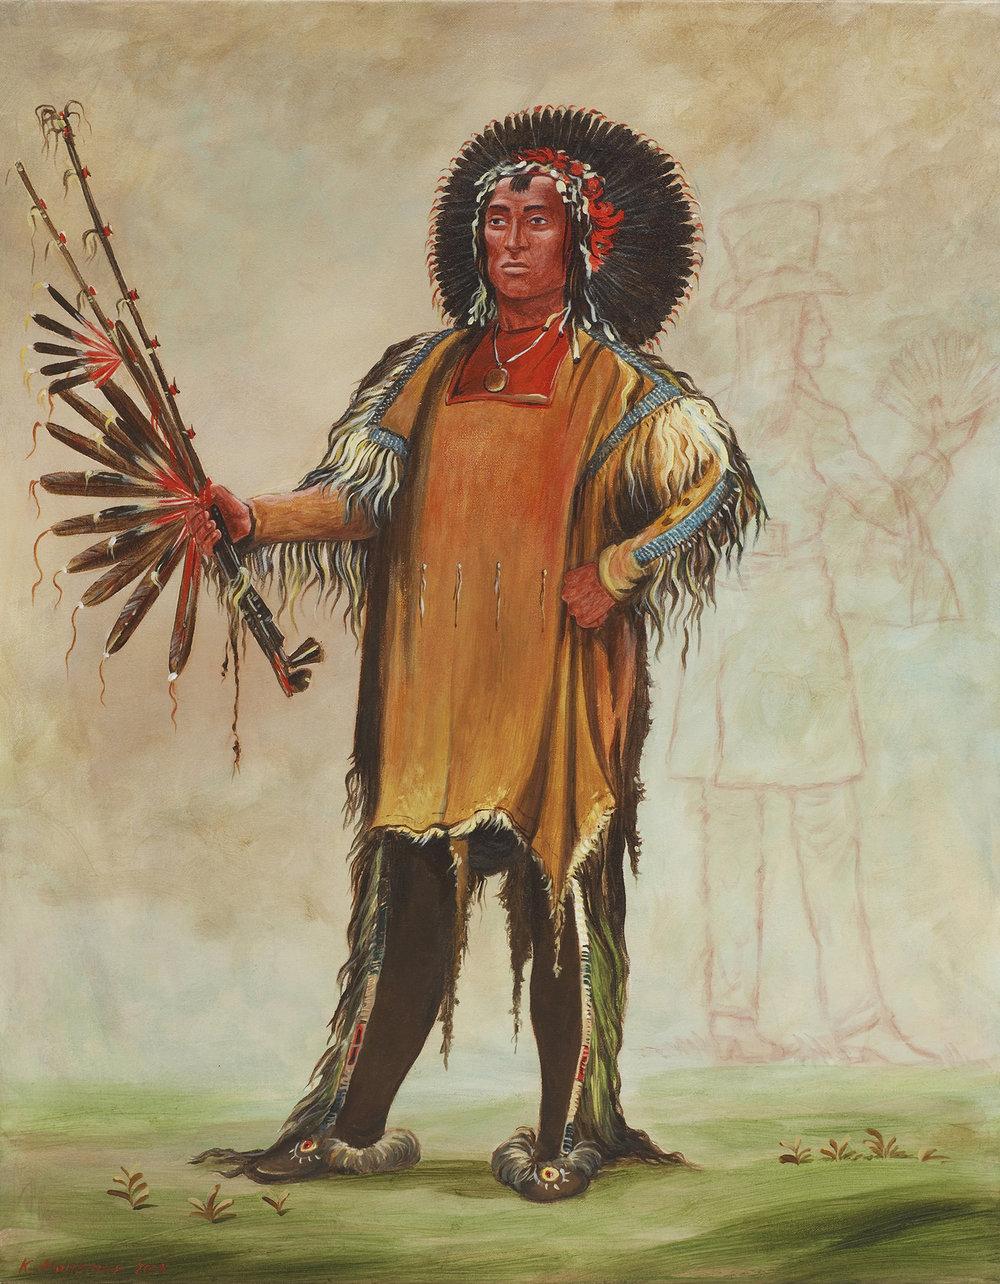 Ha-Na-Tá-Nu-Maúk (Wolf Chief, Head Chief of the Tribe) with Indian Beau 8,566